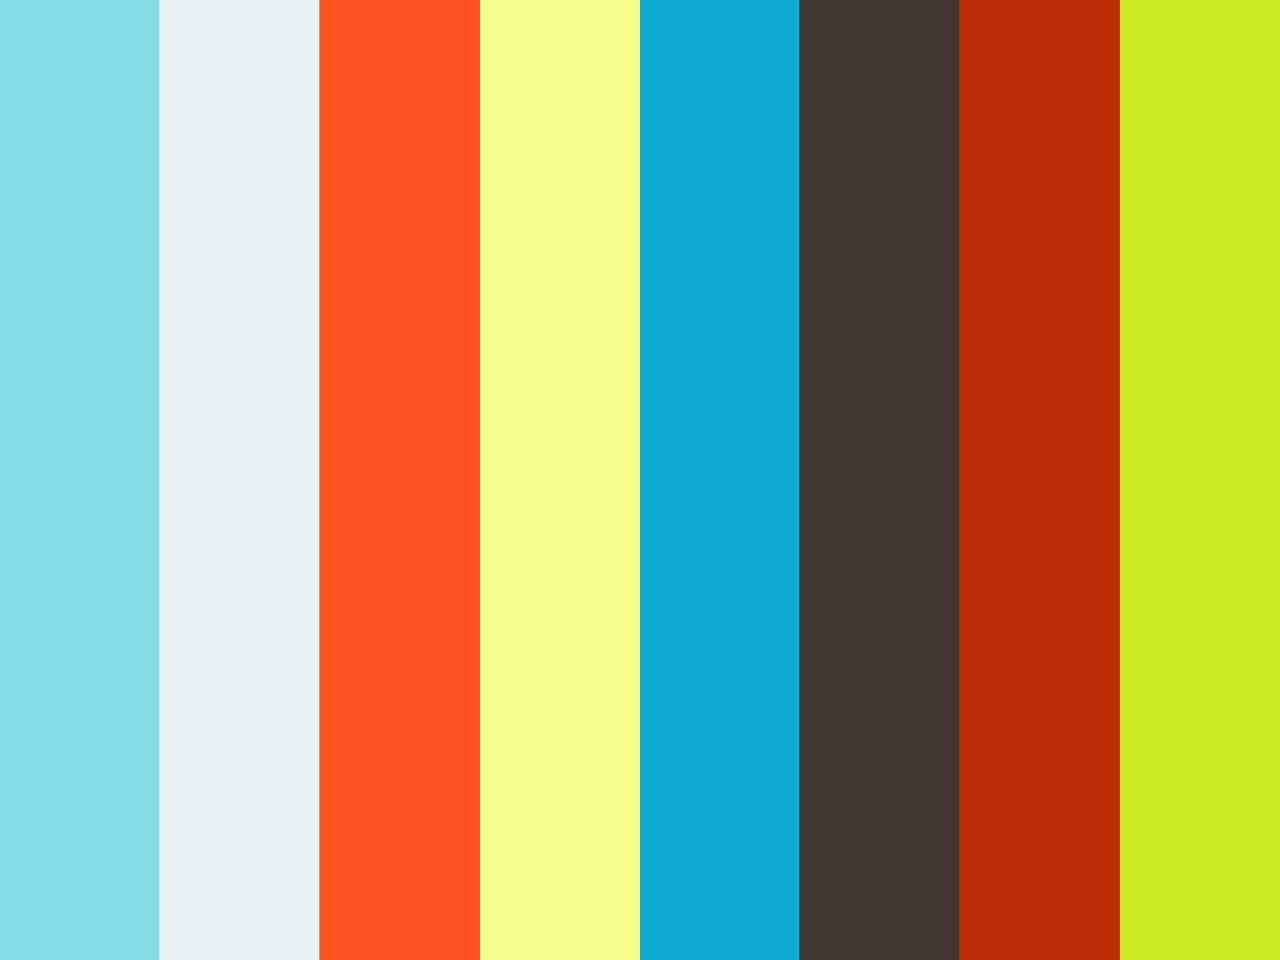 Michael D. Fiore - TOPS App Trailer